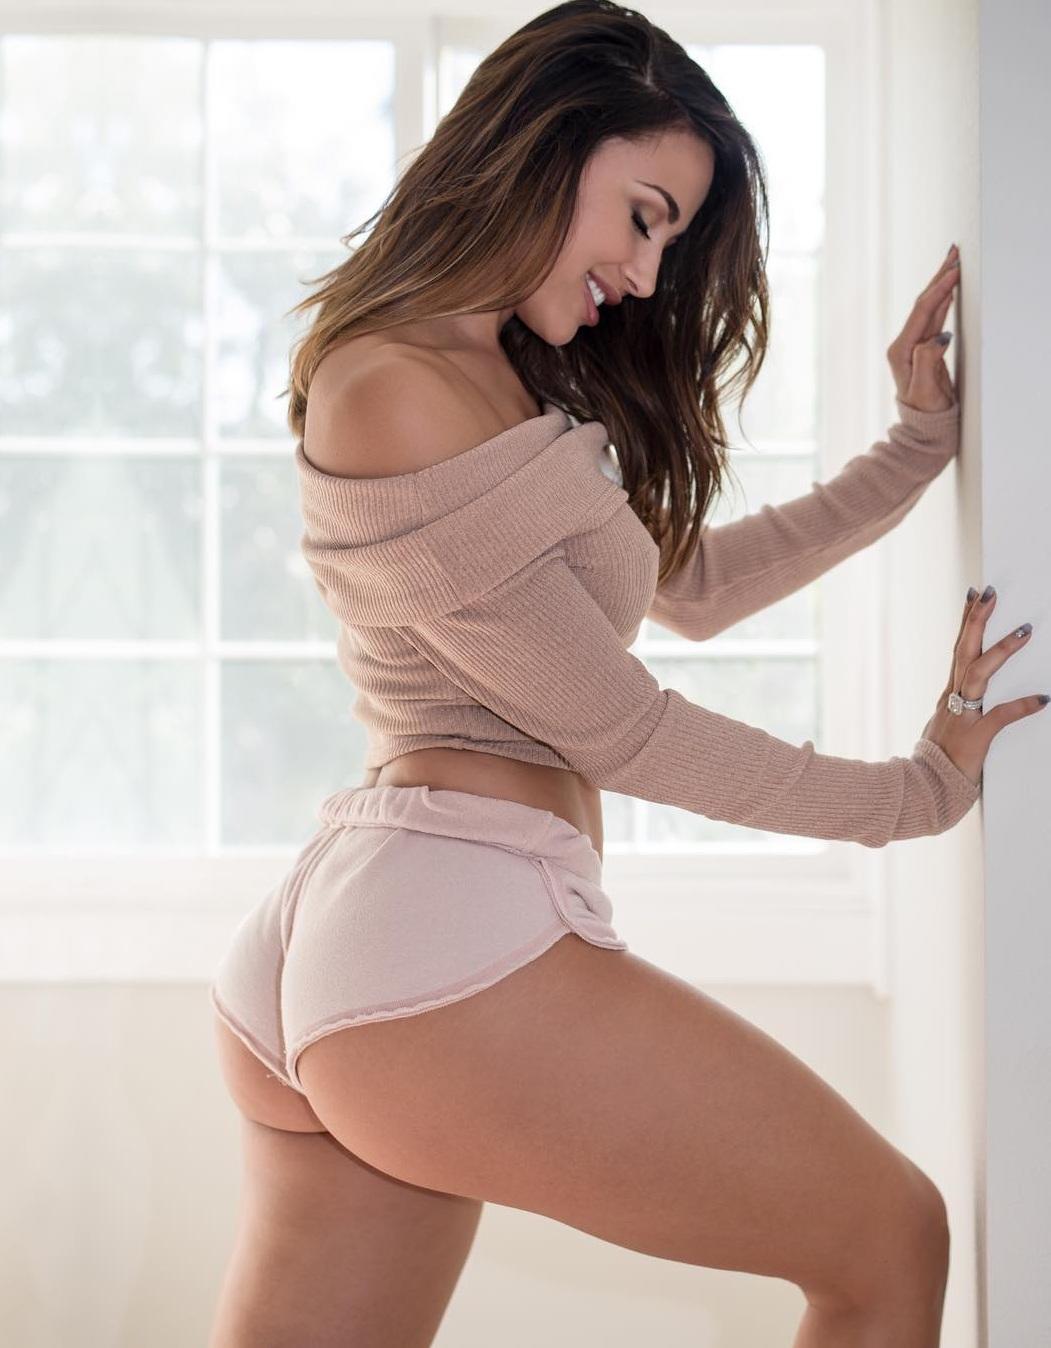 Cheri fitness ana Ana Cheri